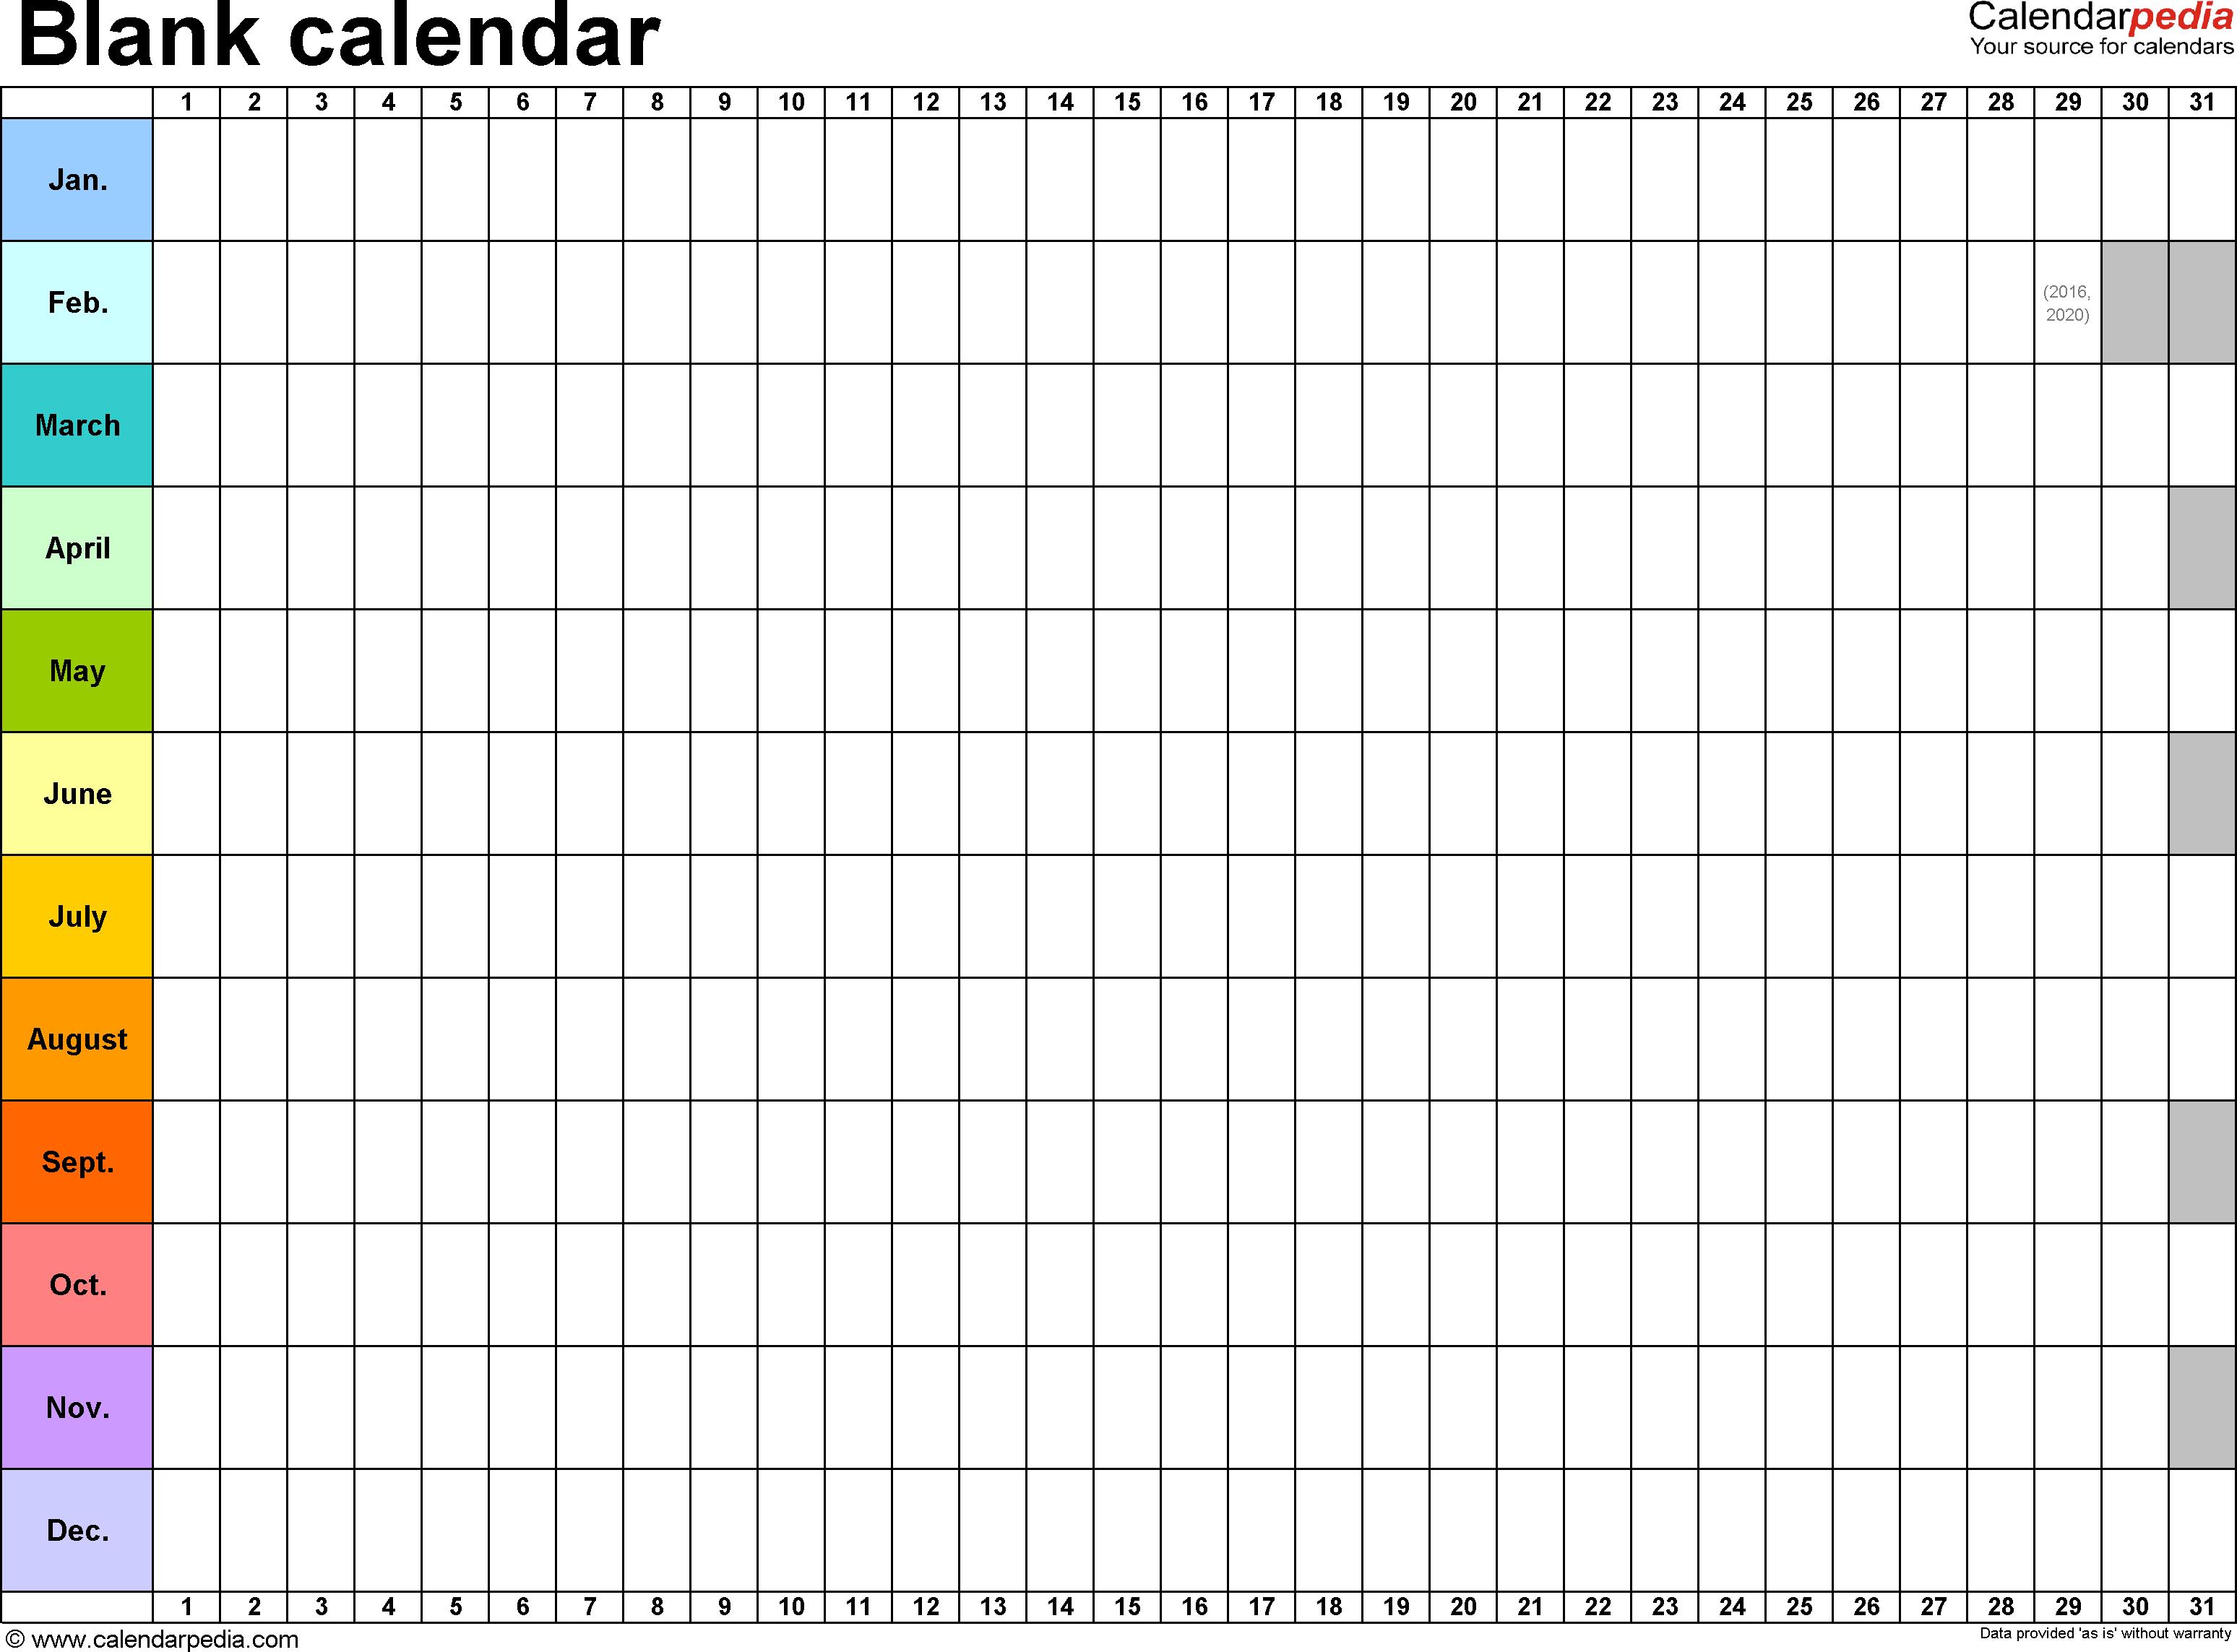 Blank Calendar - 9 Free Printable Microsoft Word Templates inside Free Blank Calendars By Month